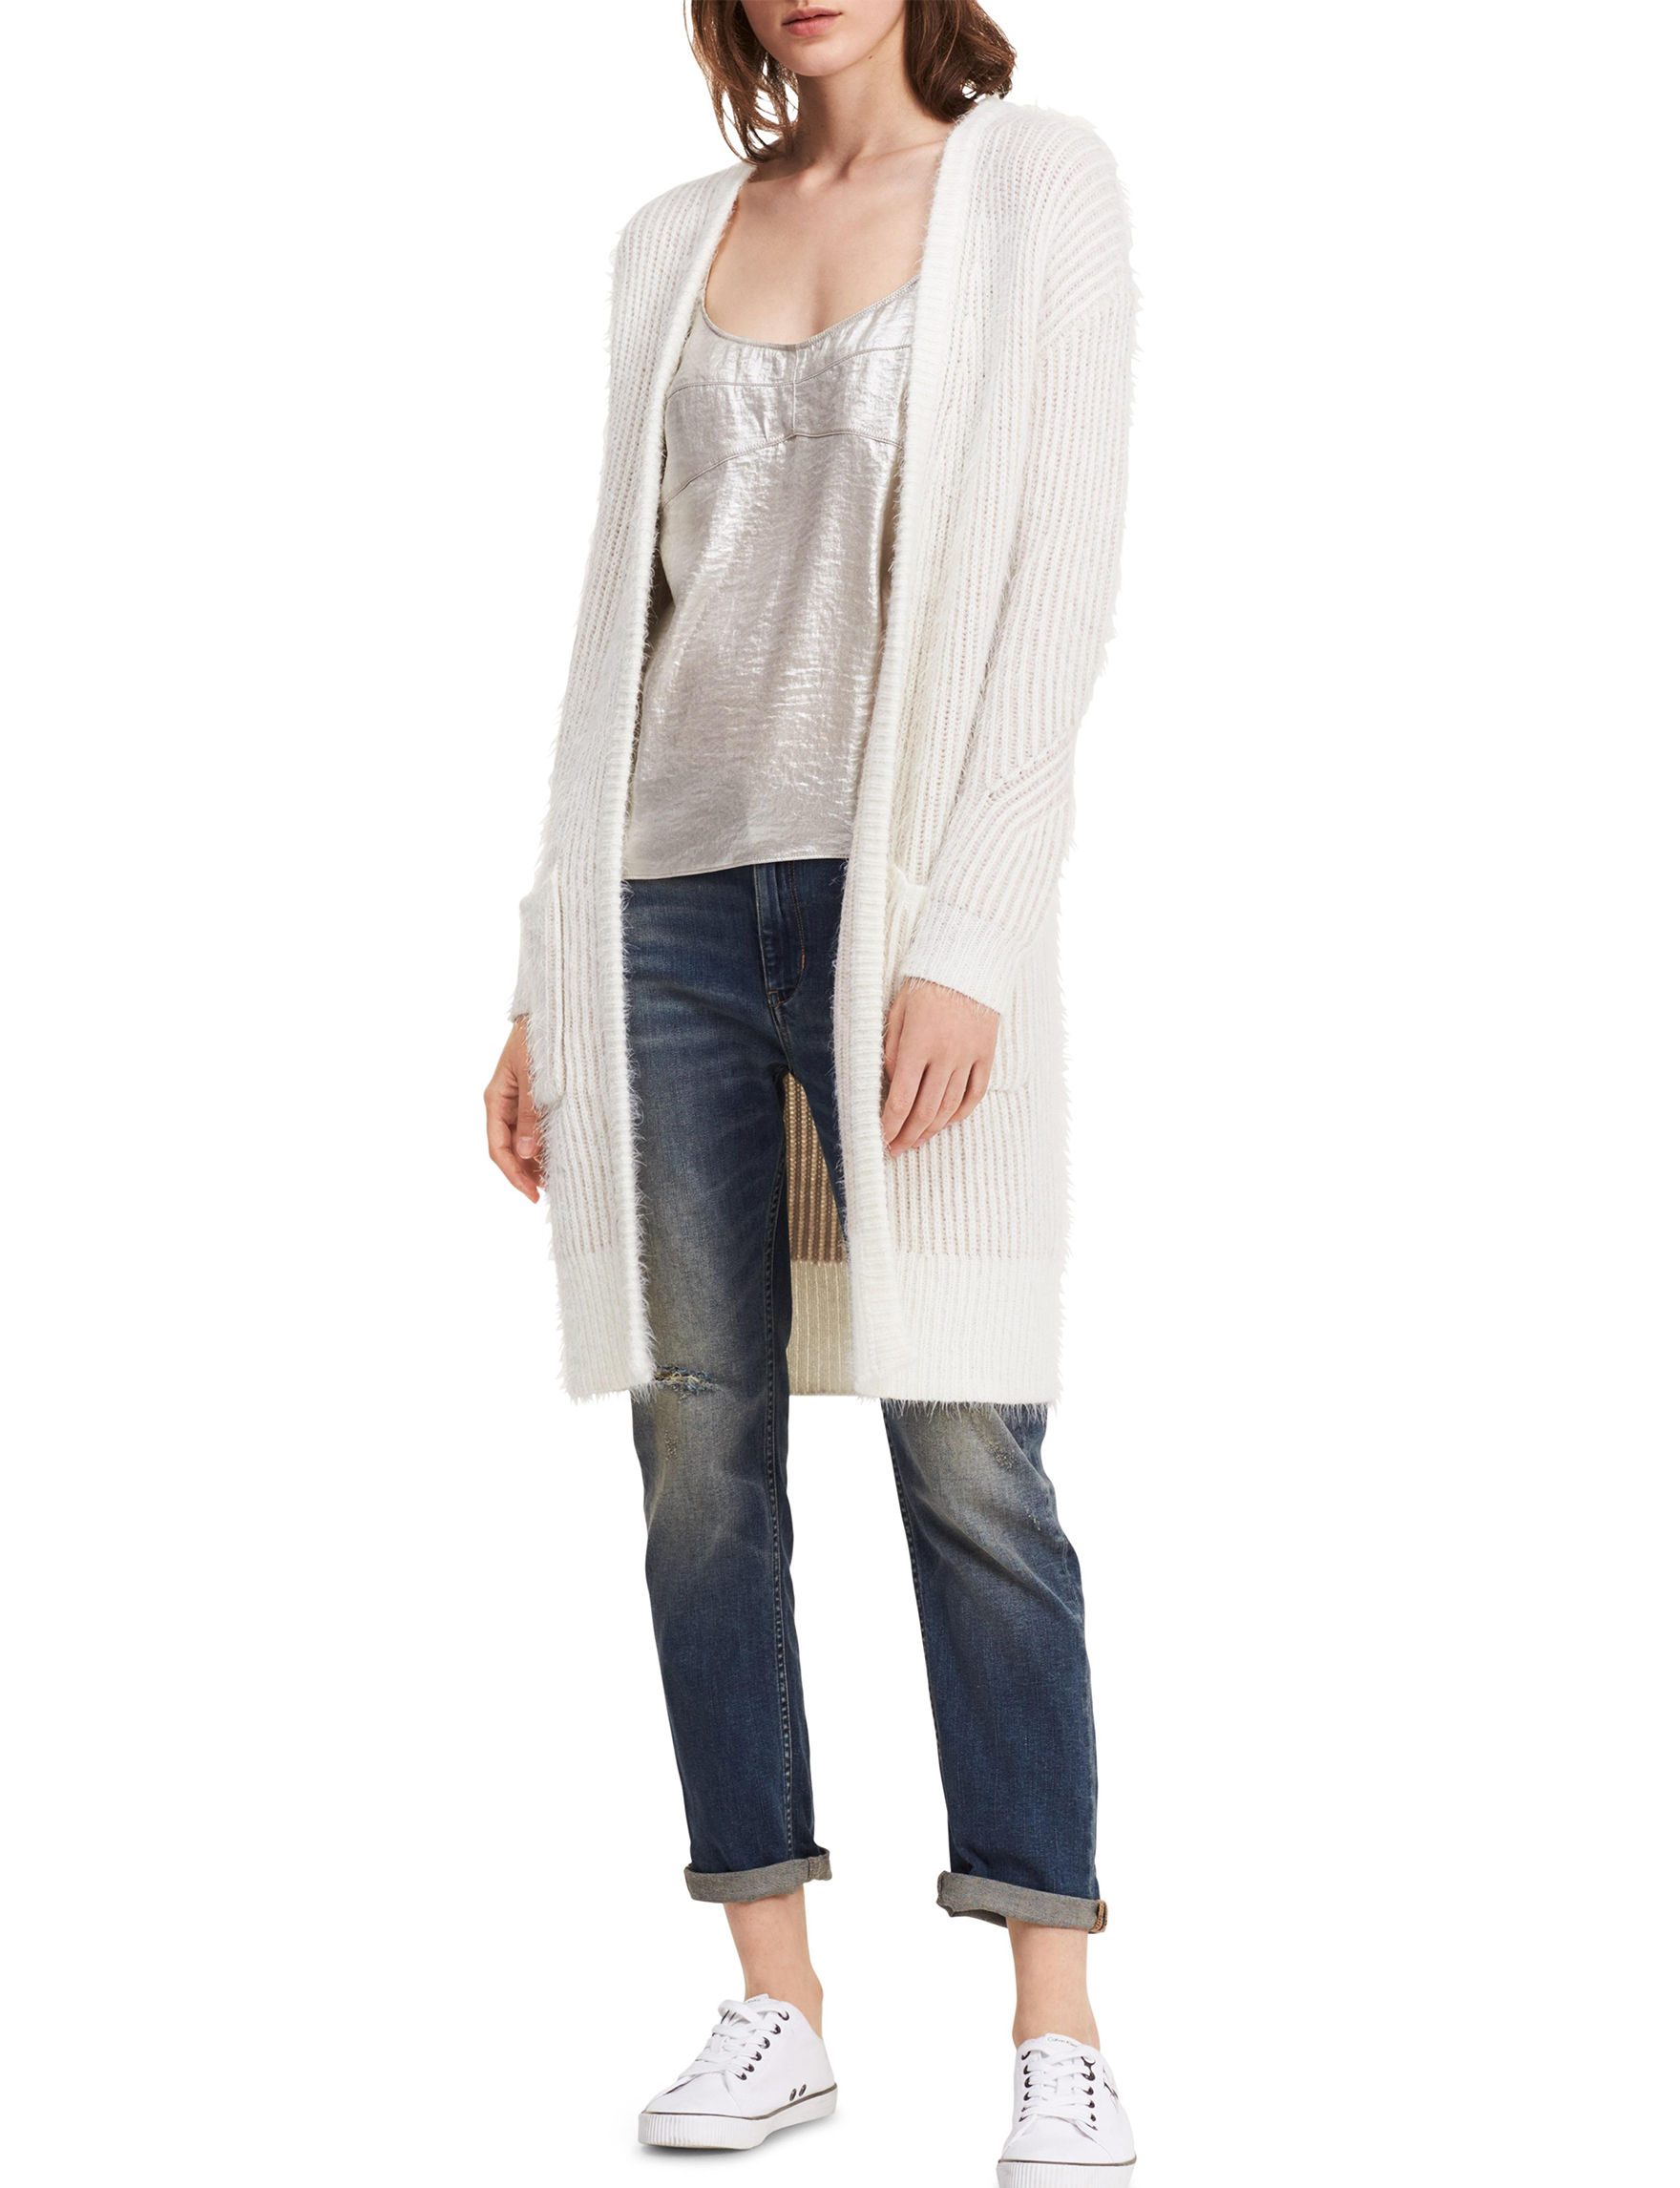 Calvin Klein Jeans White Cardigans